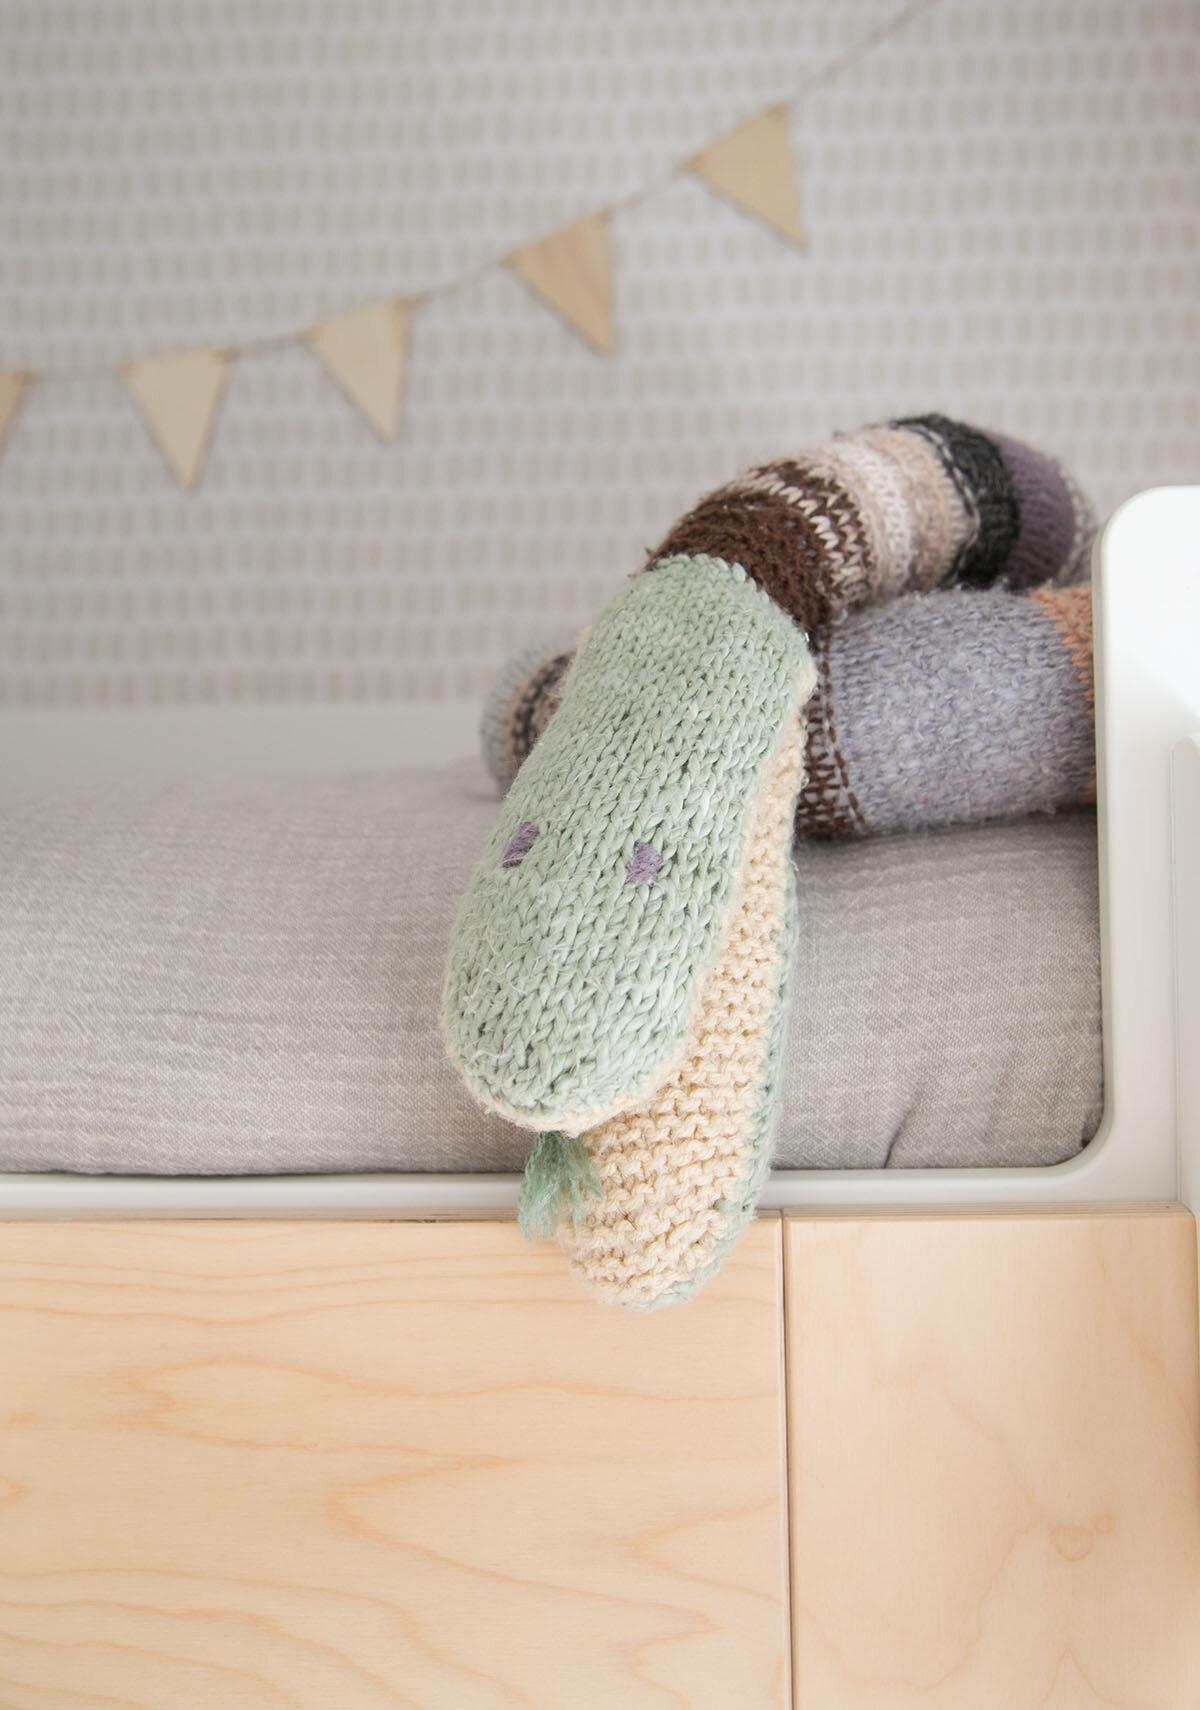 hand knit snake toy